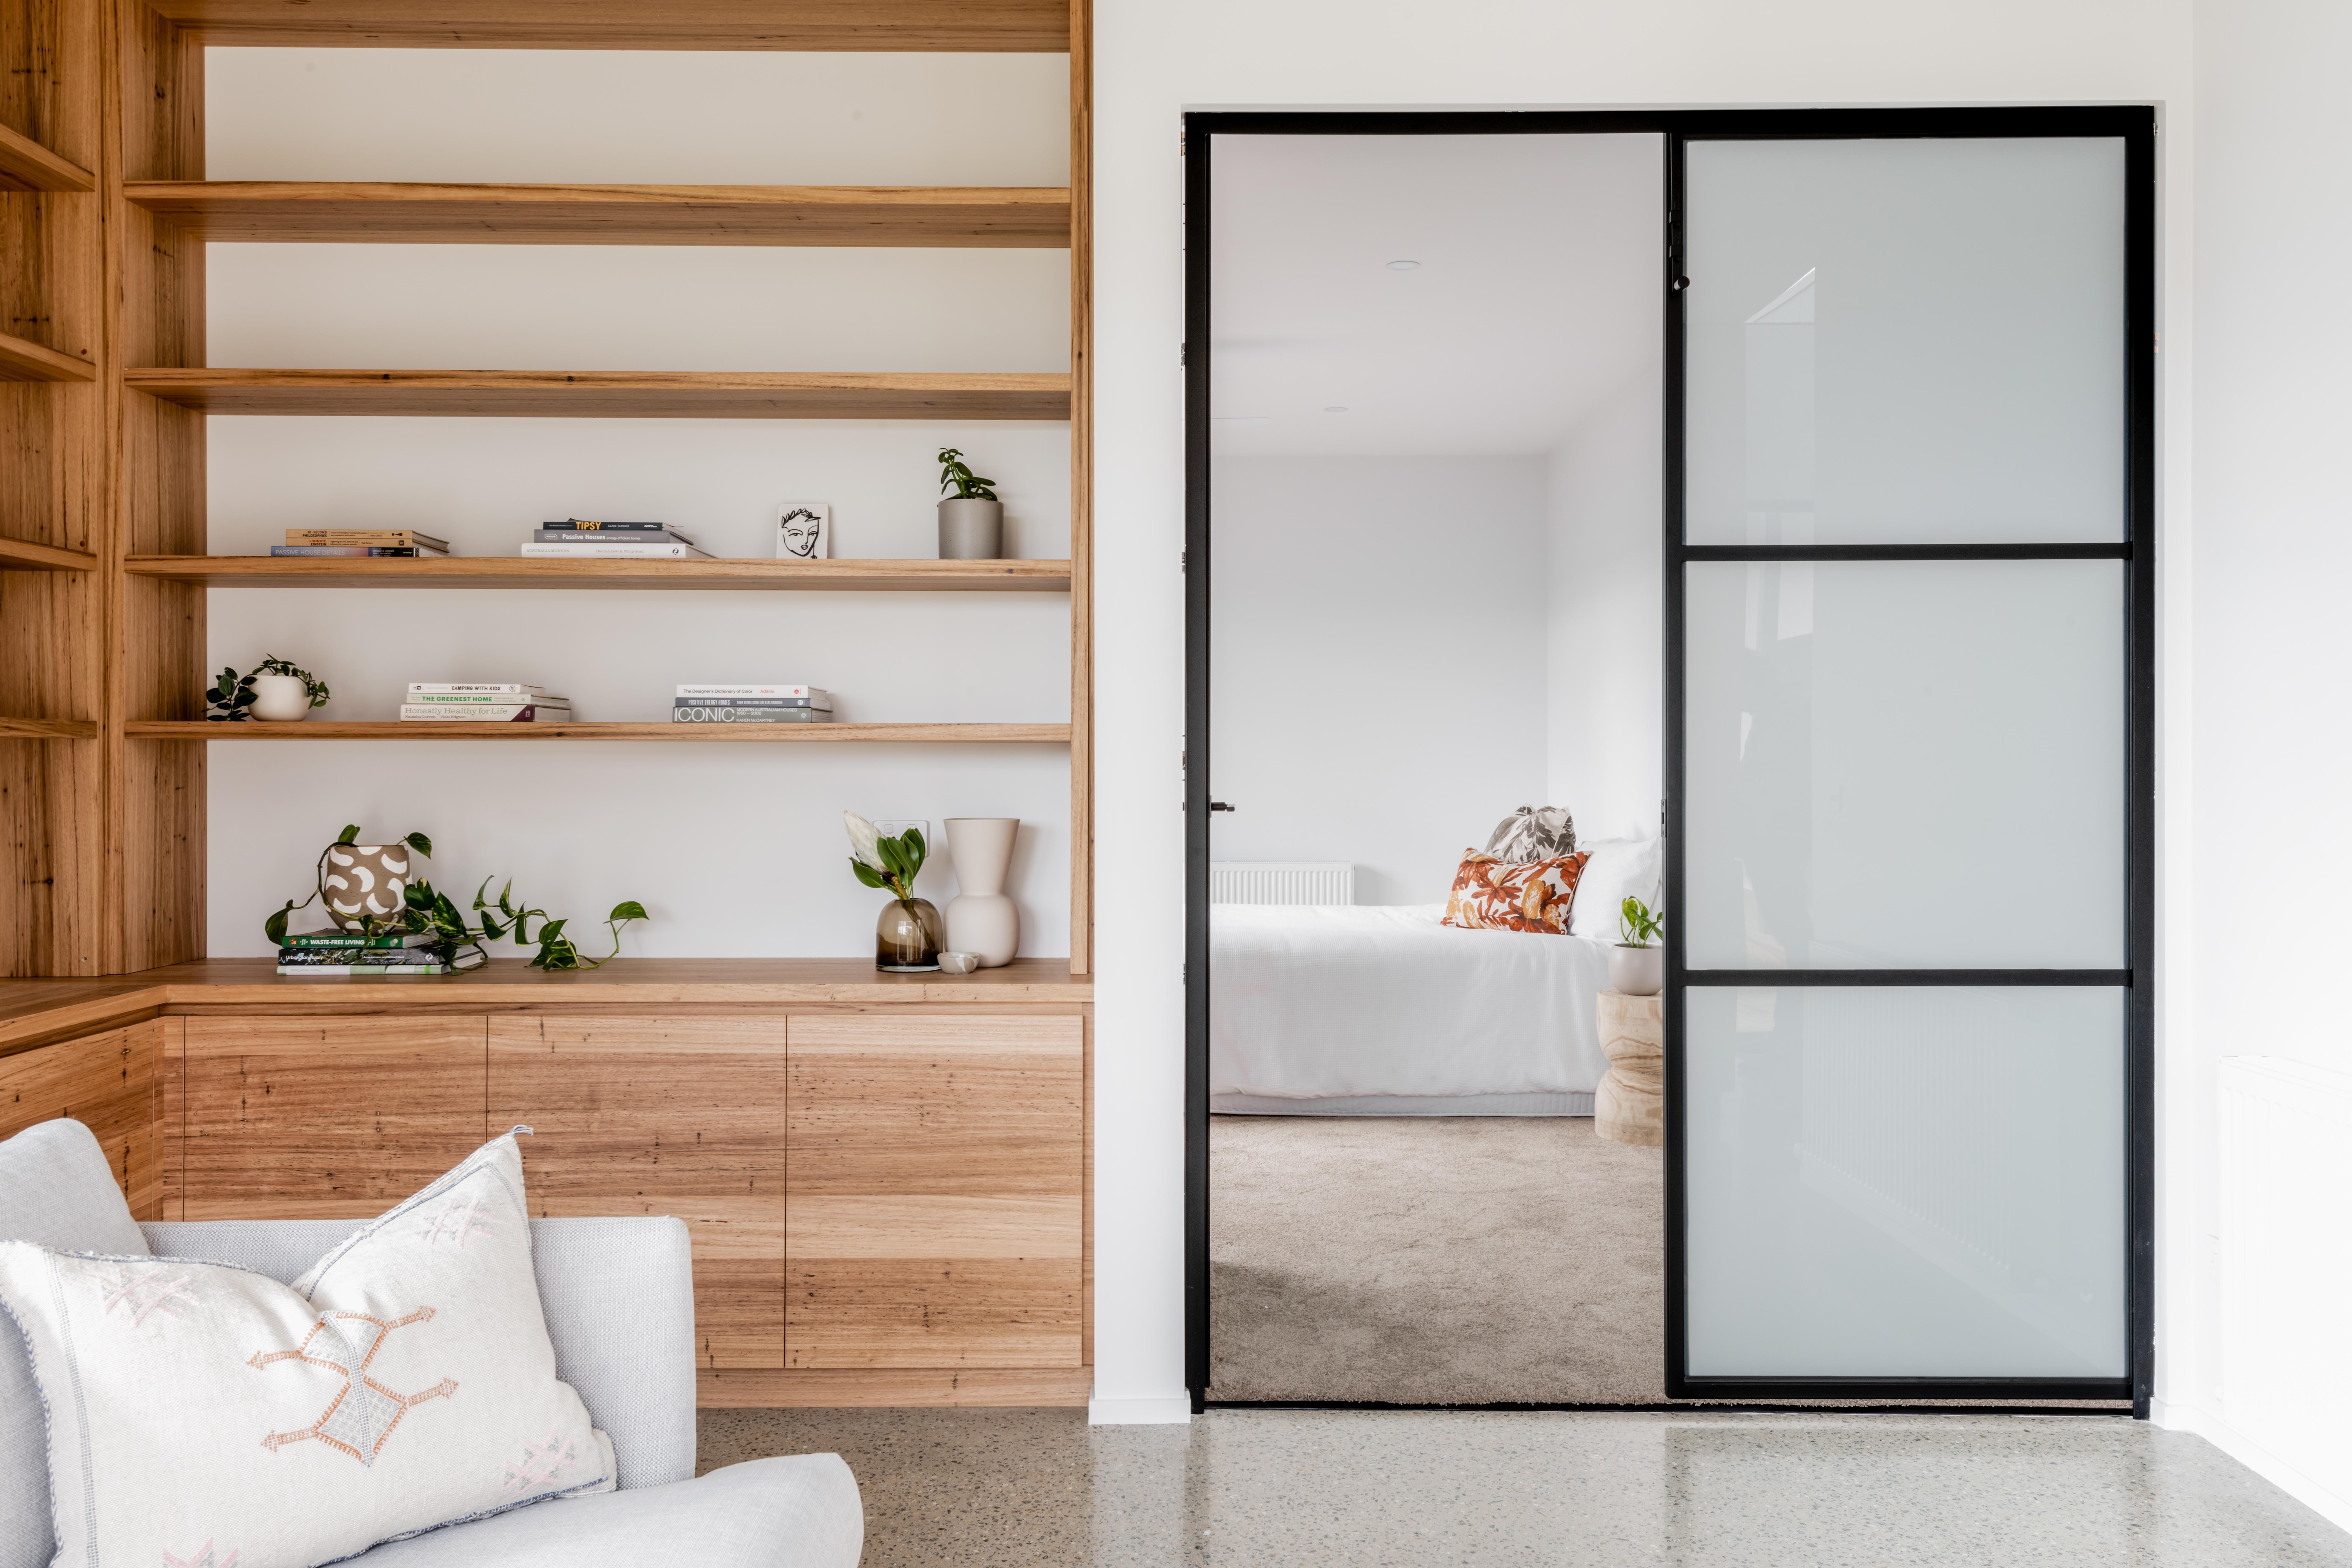 Belco Group Geelong Drafting & Building Design